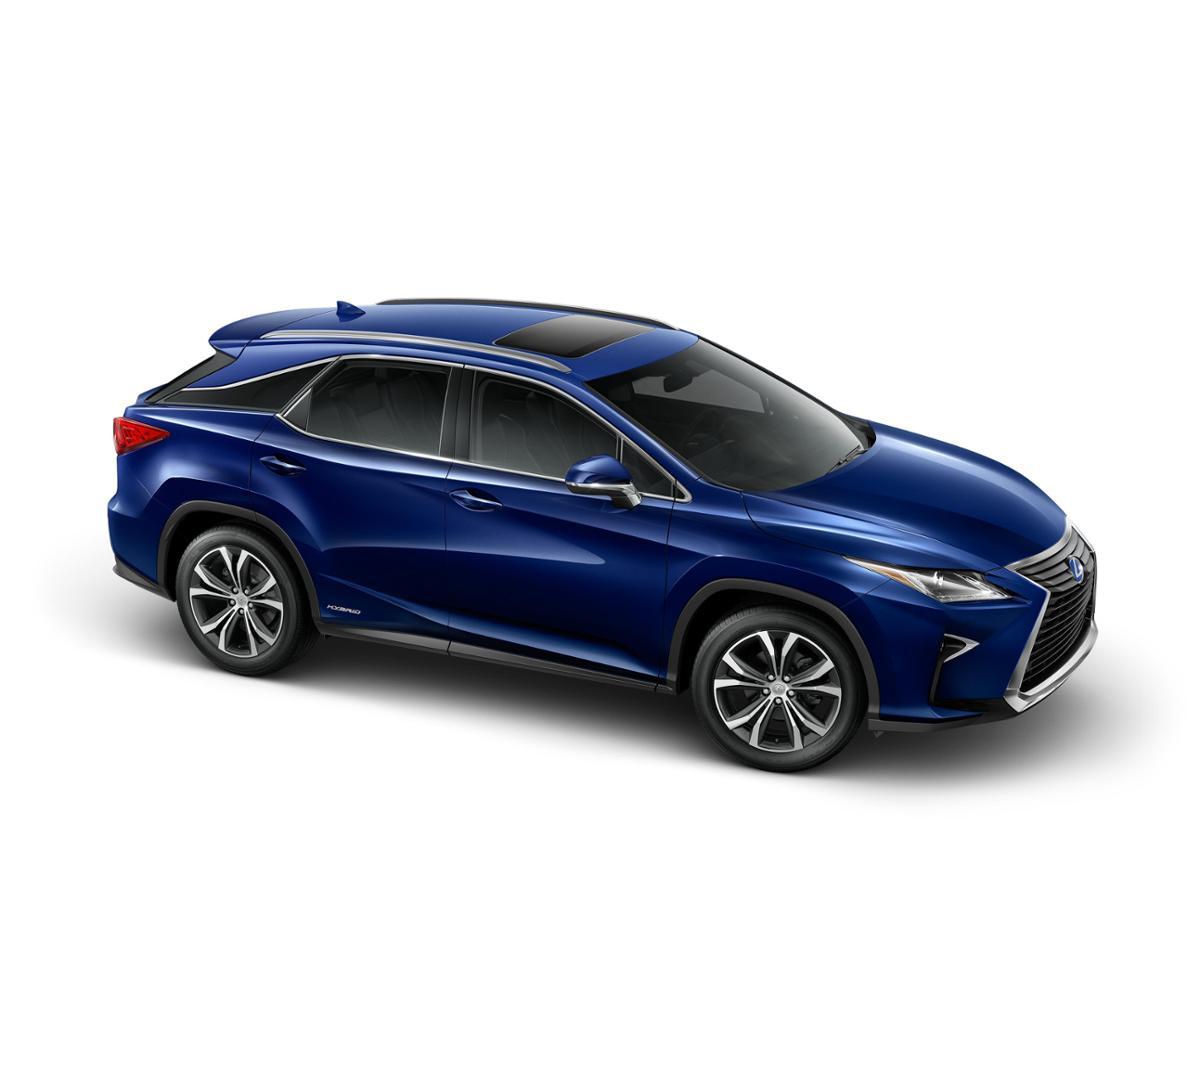 Lexus Dealer Towson Md >> Towson Nightfall Mica 2018 Lexus RX 450h: New Suv for Sale -Y21648